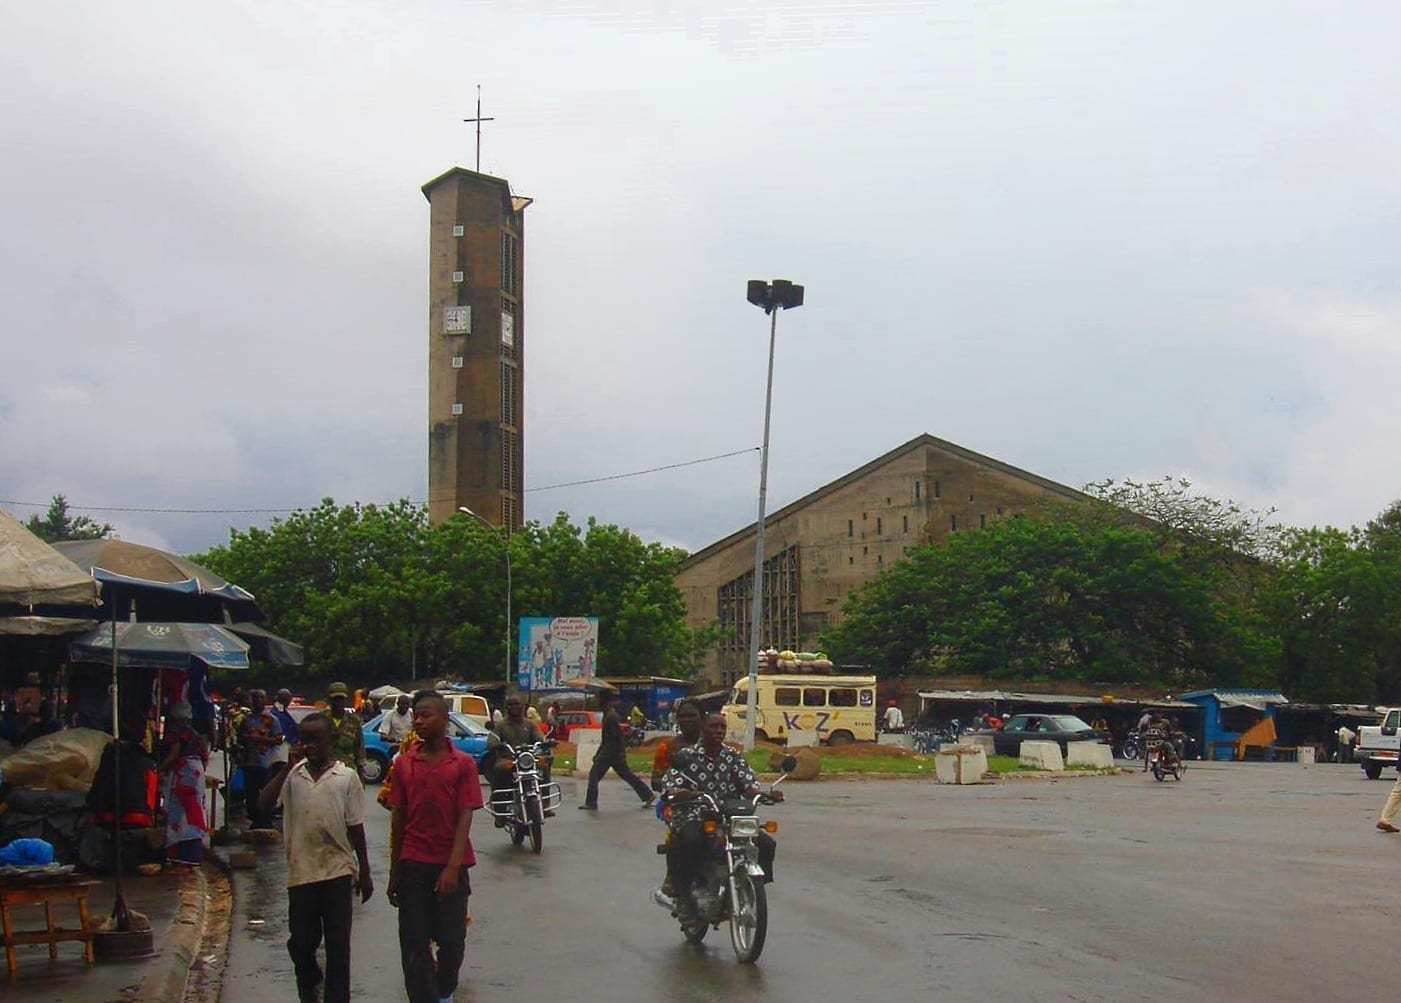 La catedral de Bouaké. Costa de Marfil